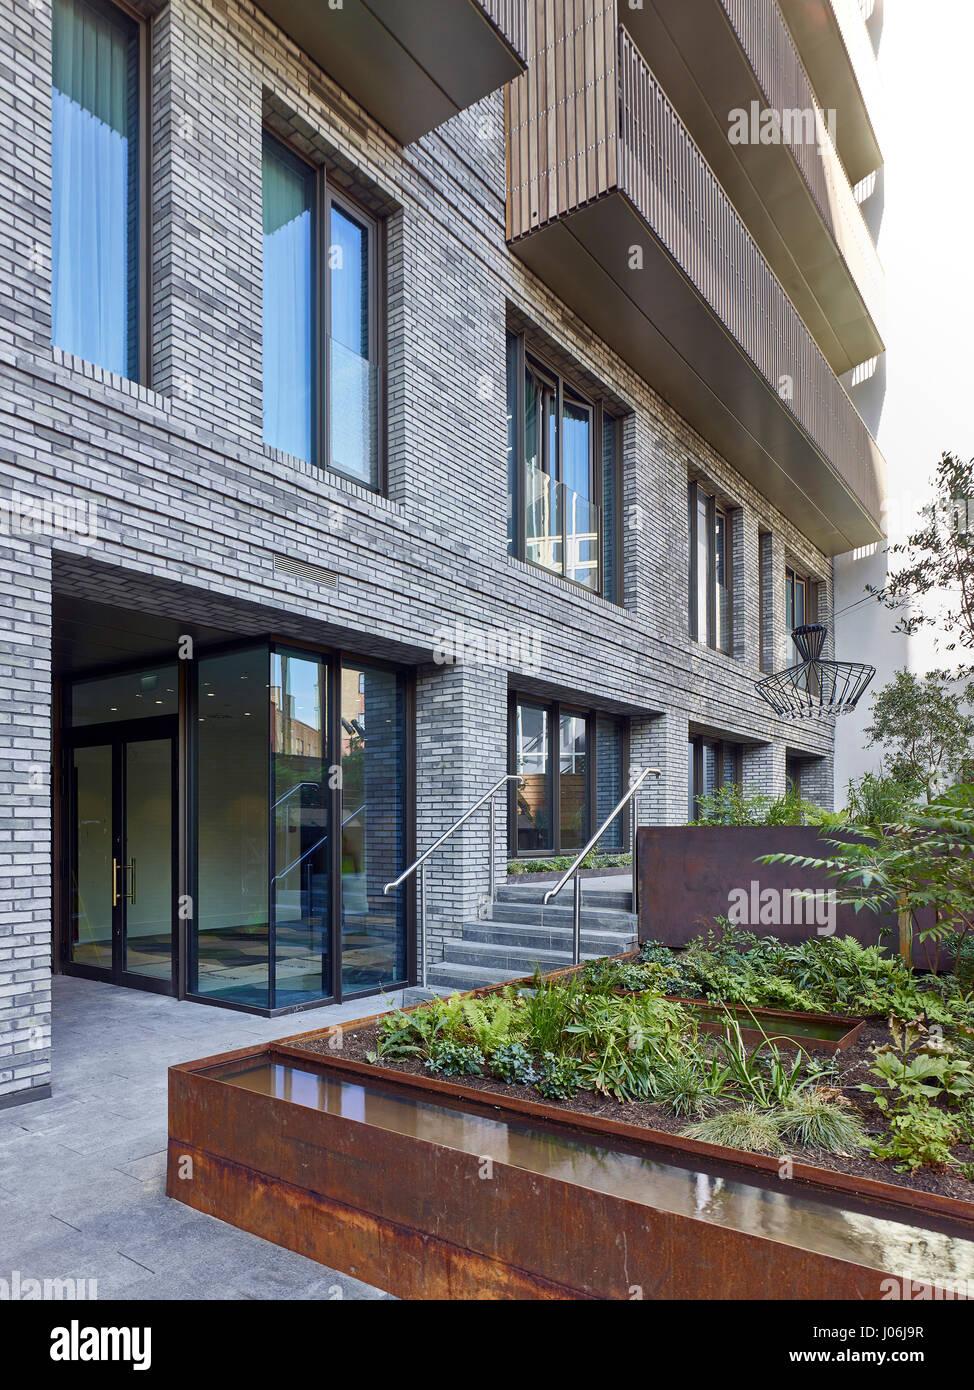 Garden. 55 Victoria Street, London, United Kingdom. Architect: Stiff + Trevillion Architects, 2016. - Stock Image